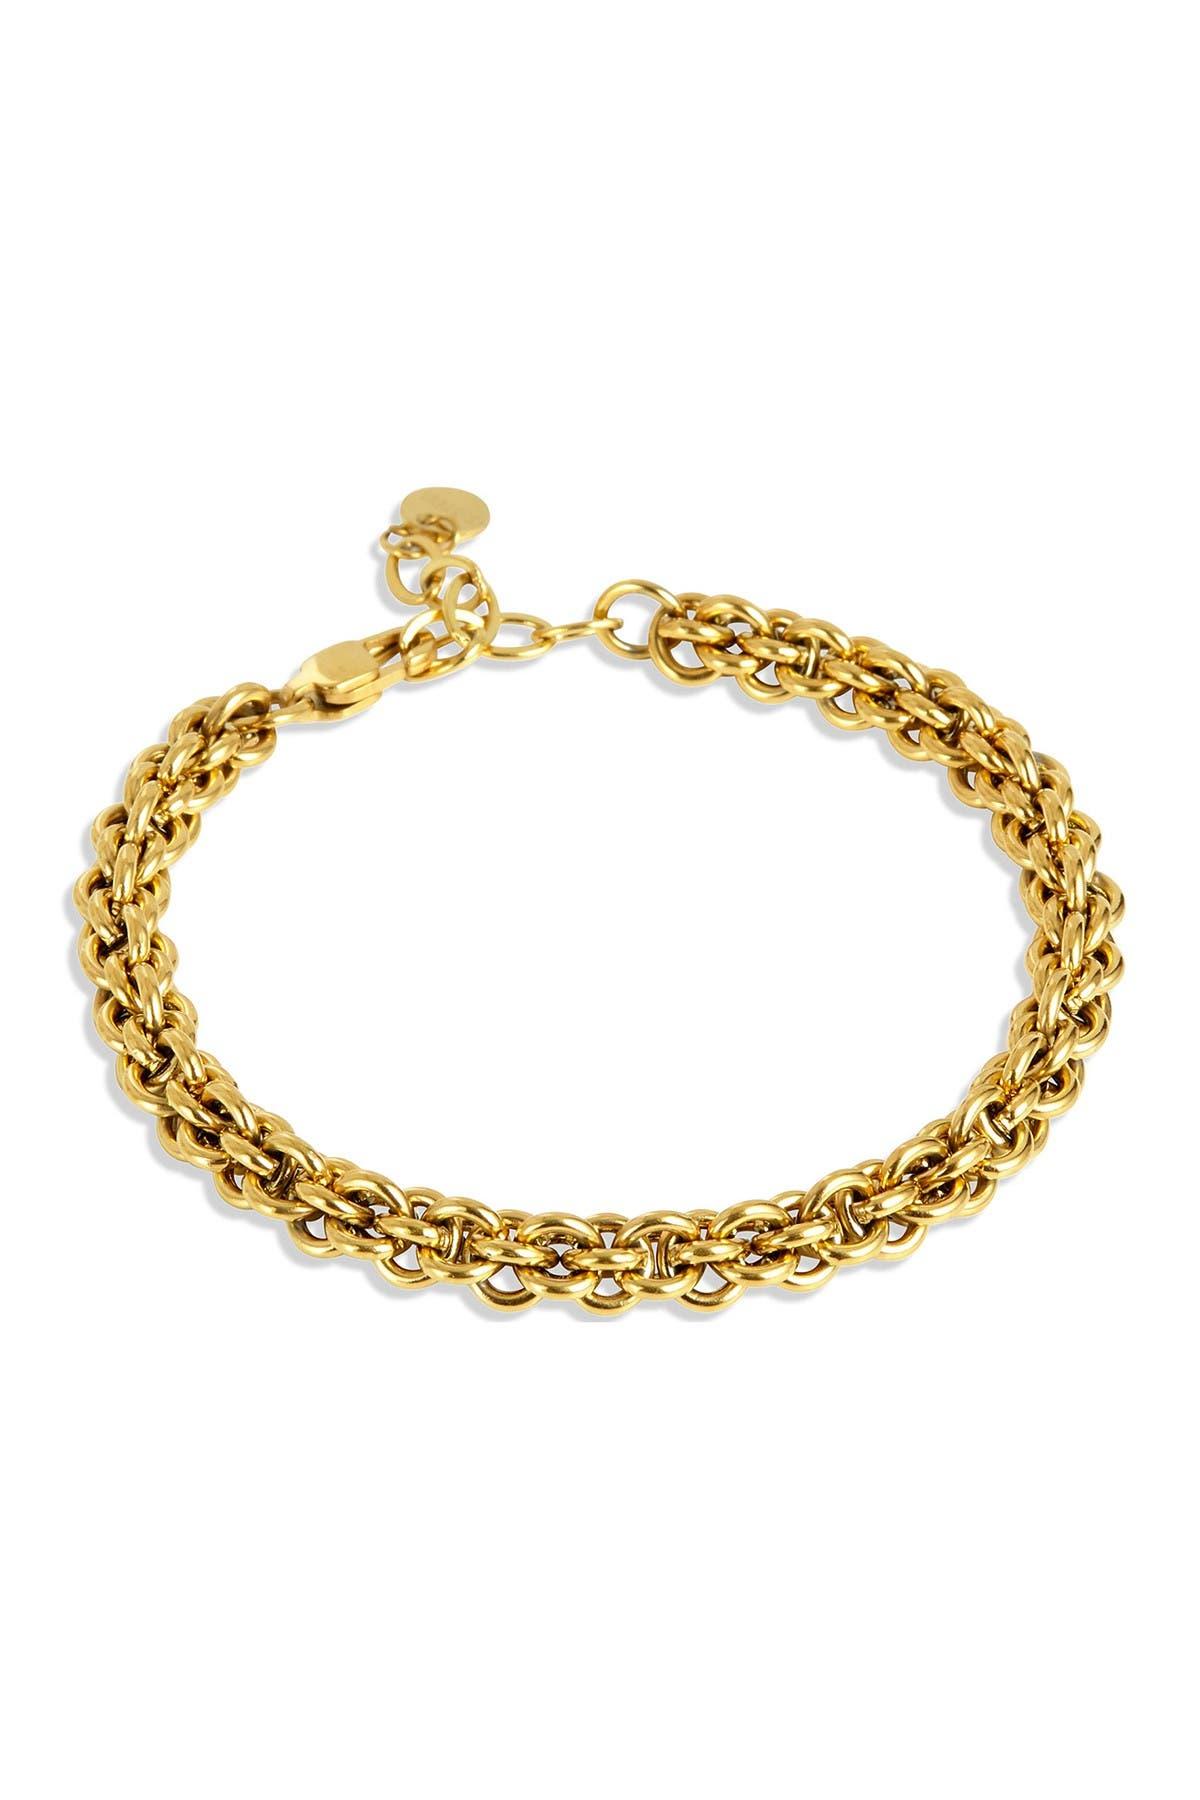 Image of Savvy Cie 14K Gold Plated Link Bracelet